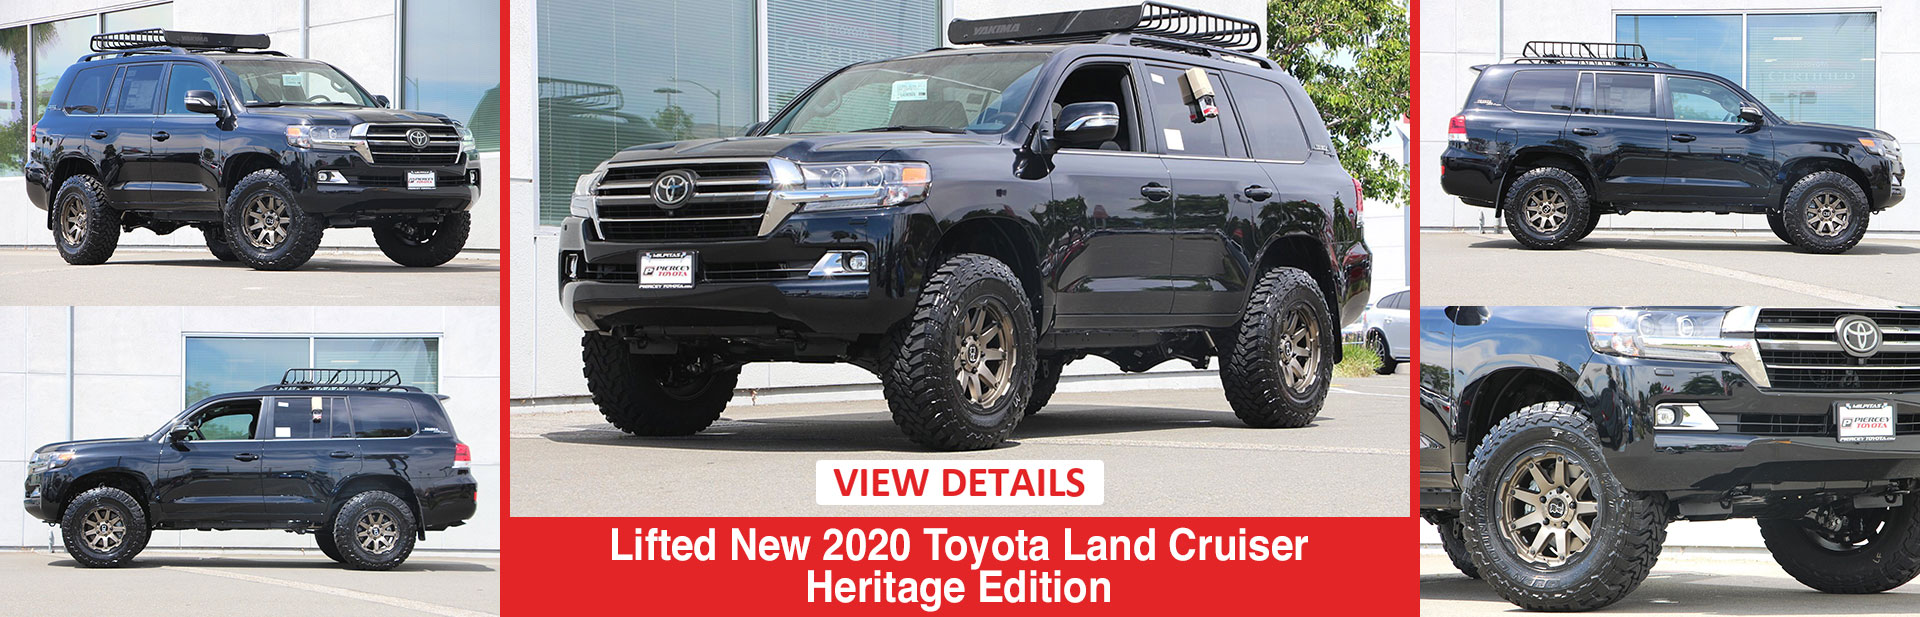 Lifted 2020 Toyota Land Cruiser Heritage